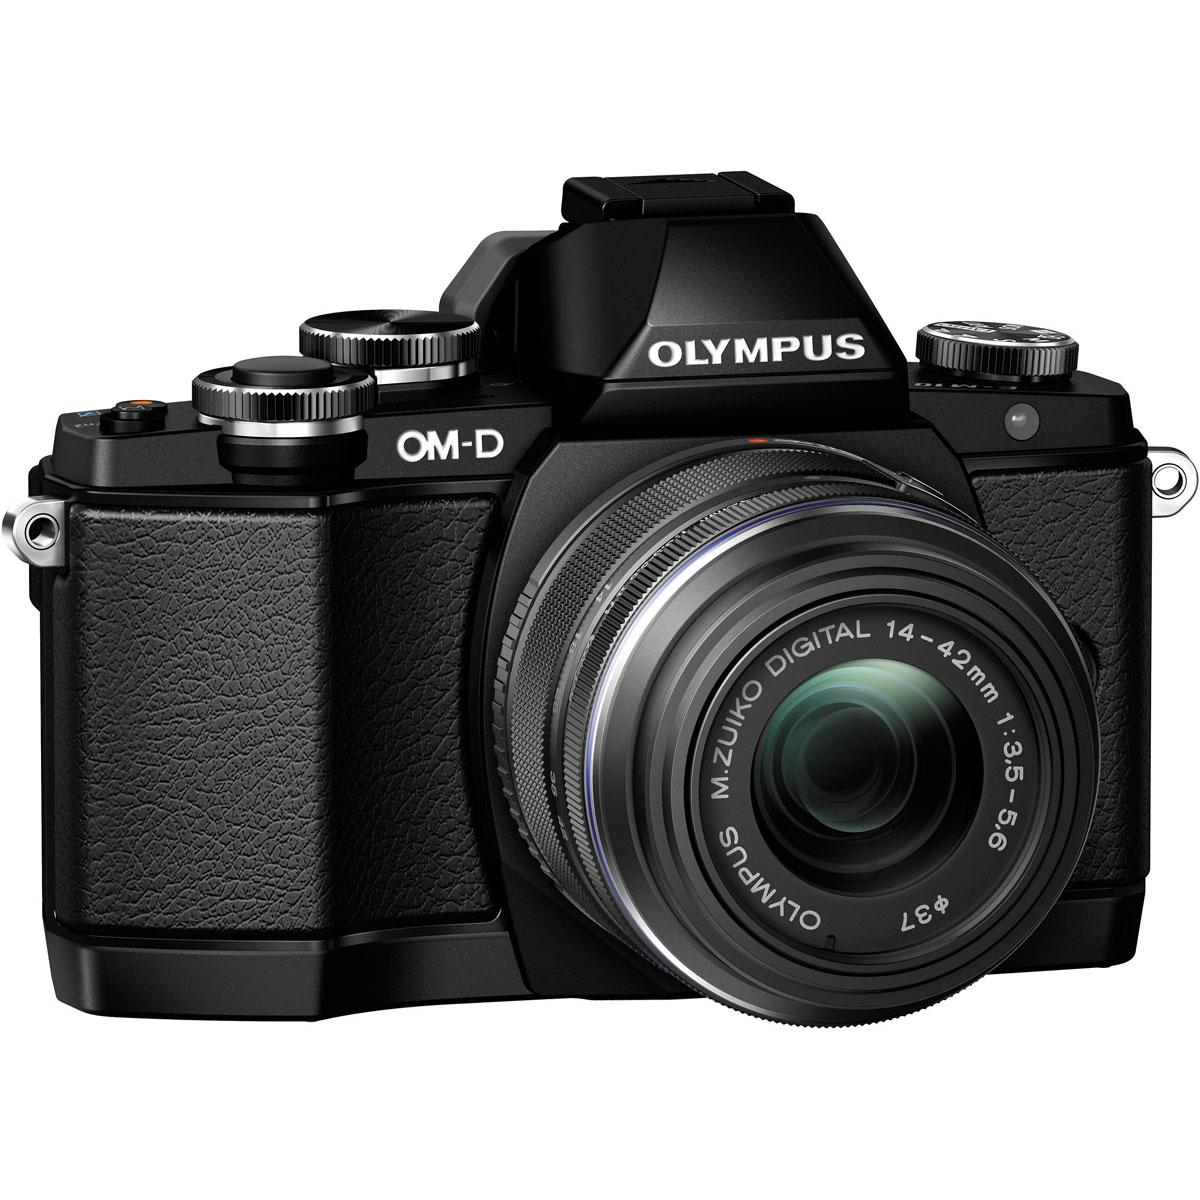 Olympus OM-D E-M10 Kit EZ-M1442 II R, Black цифровая фотокамера